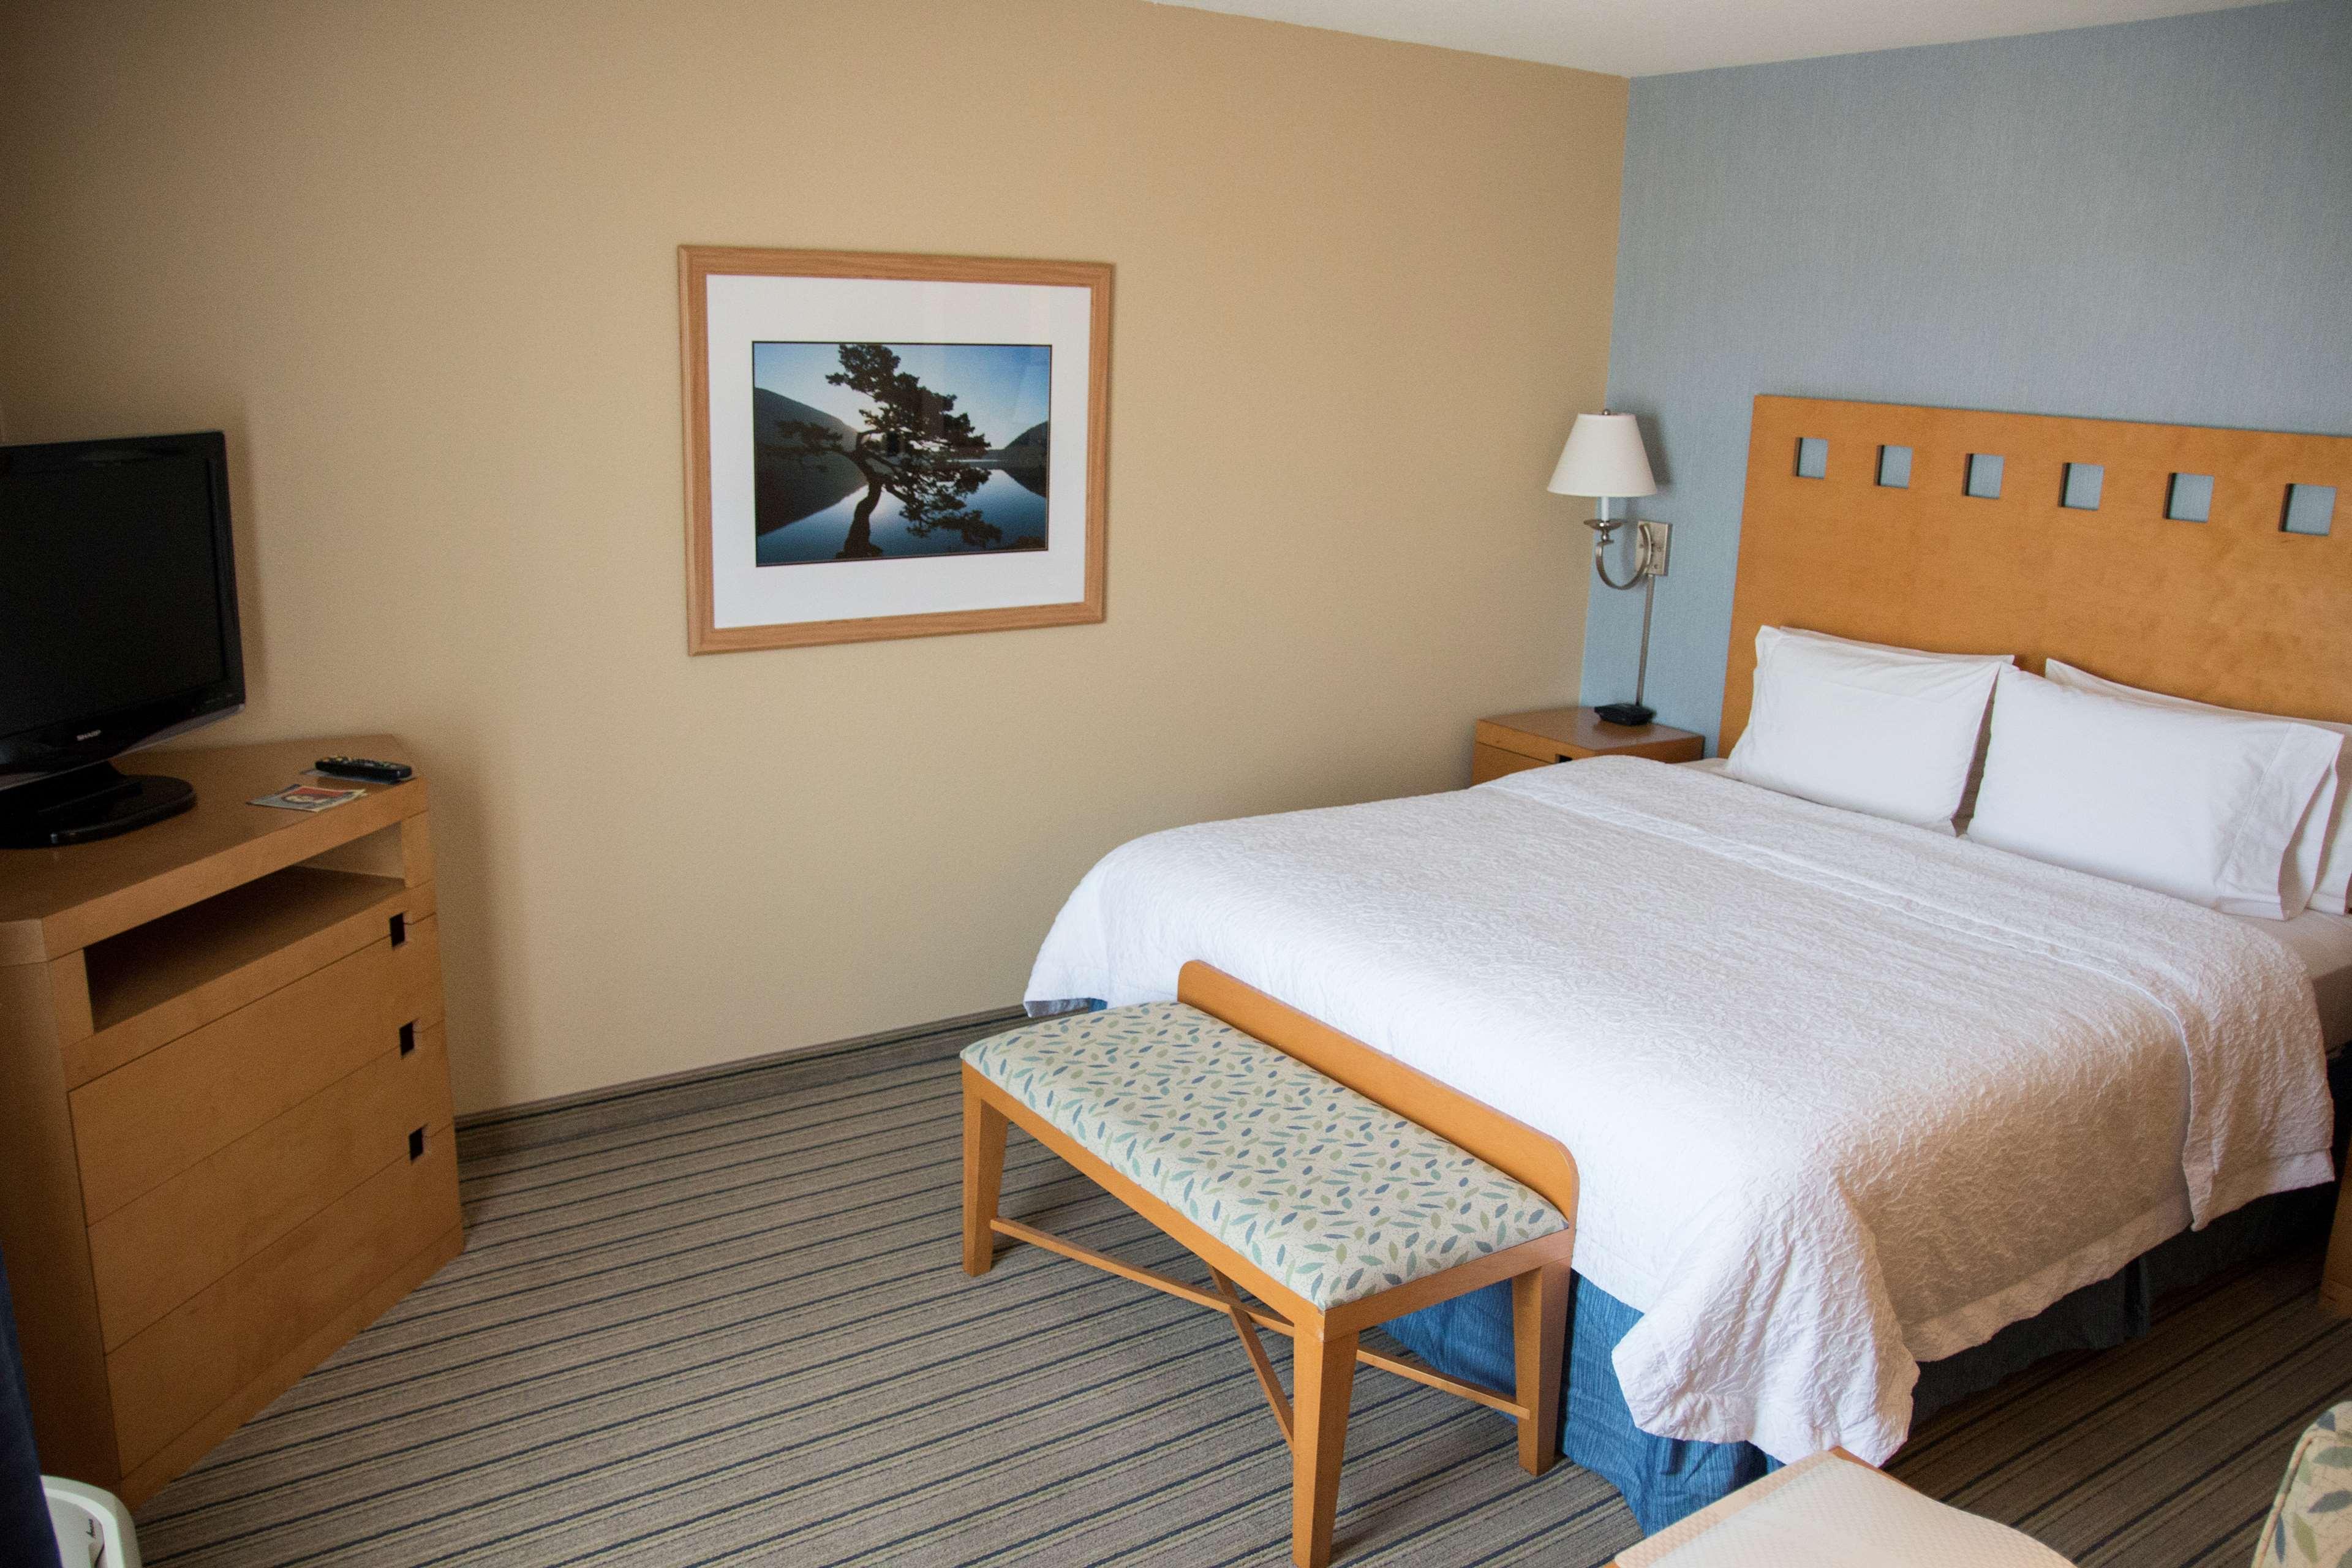 Hampton Inn & Suites Madera image 26